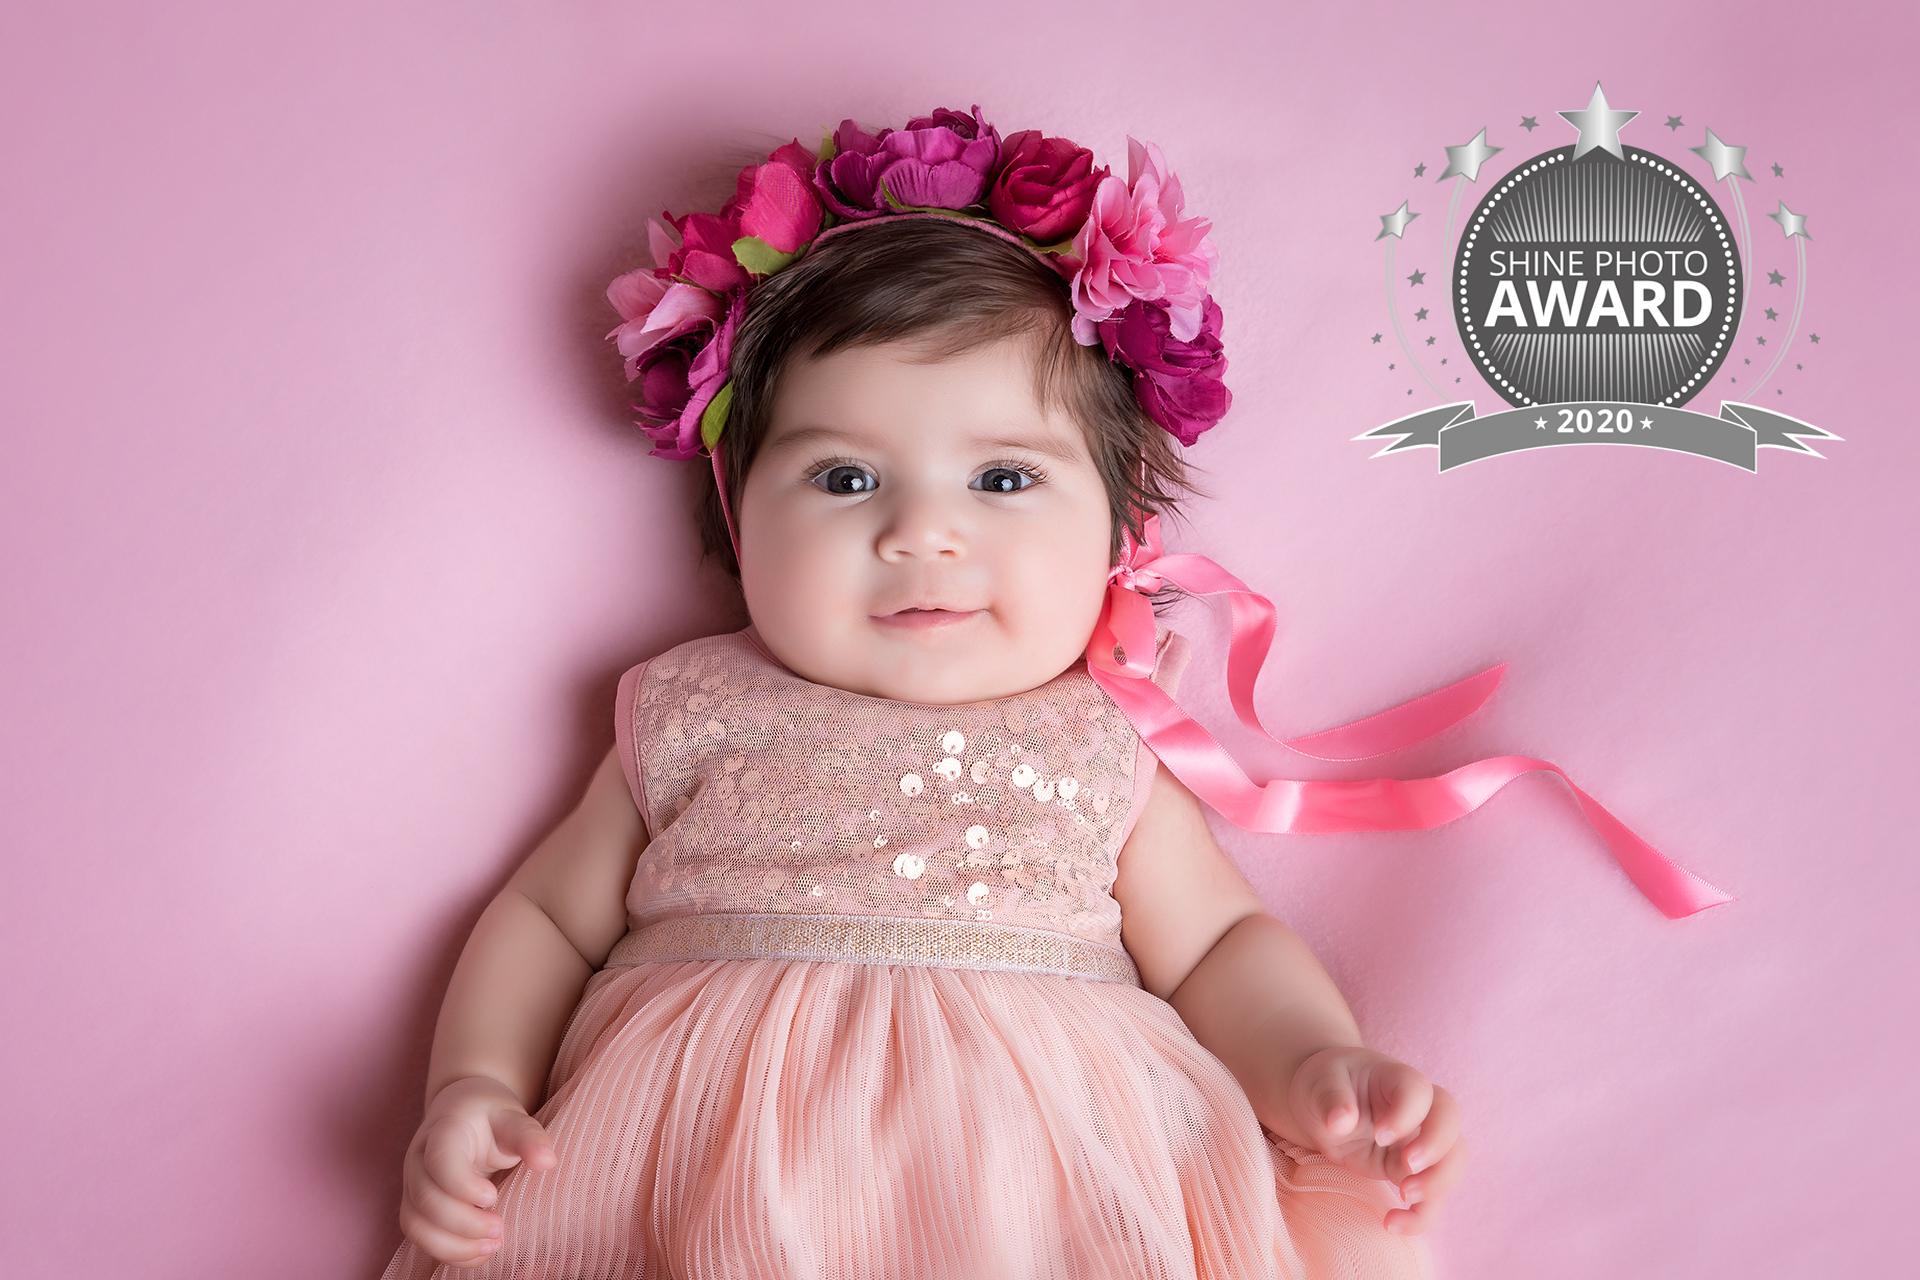 SHINE Photo Award - Winner Child & Family